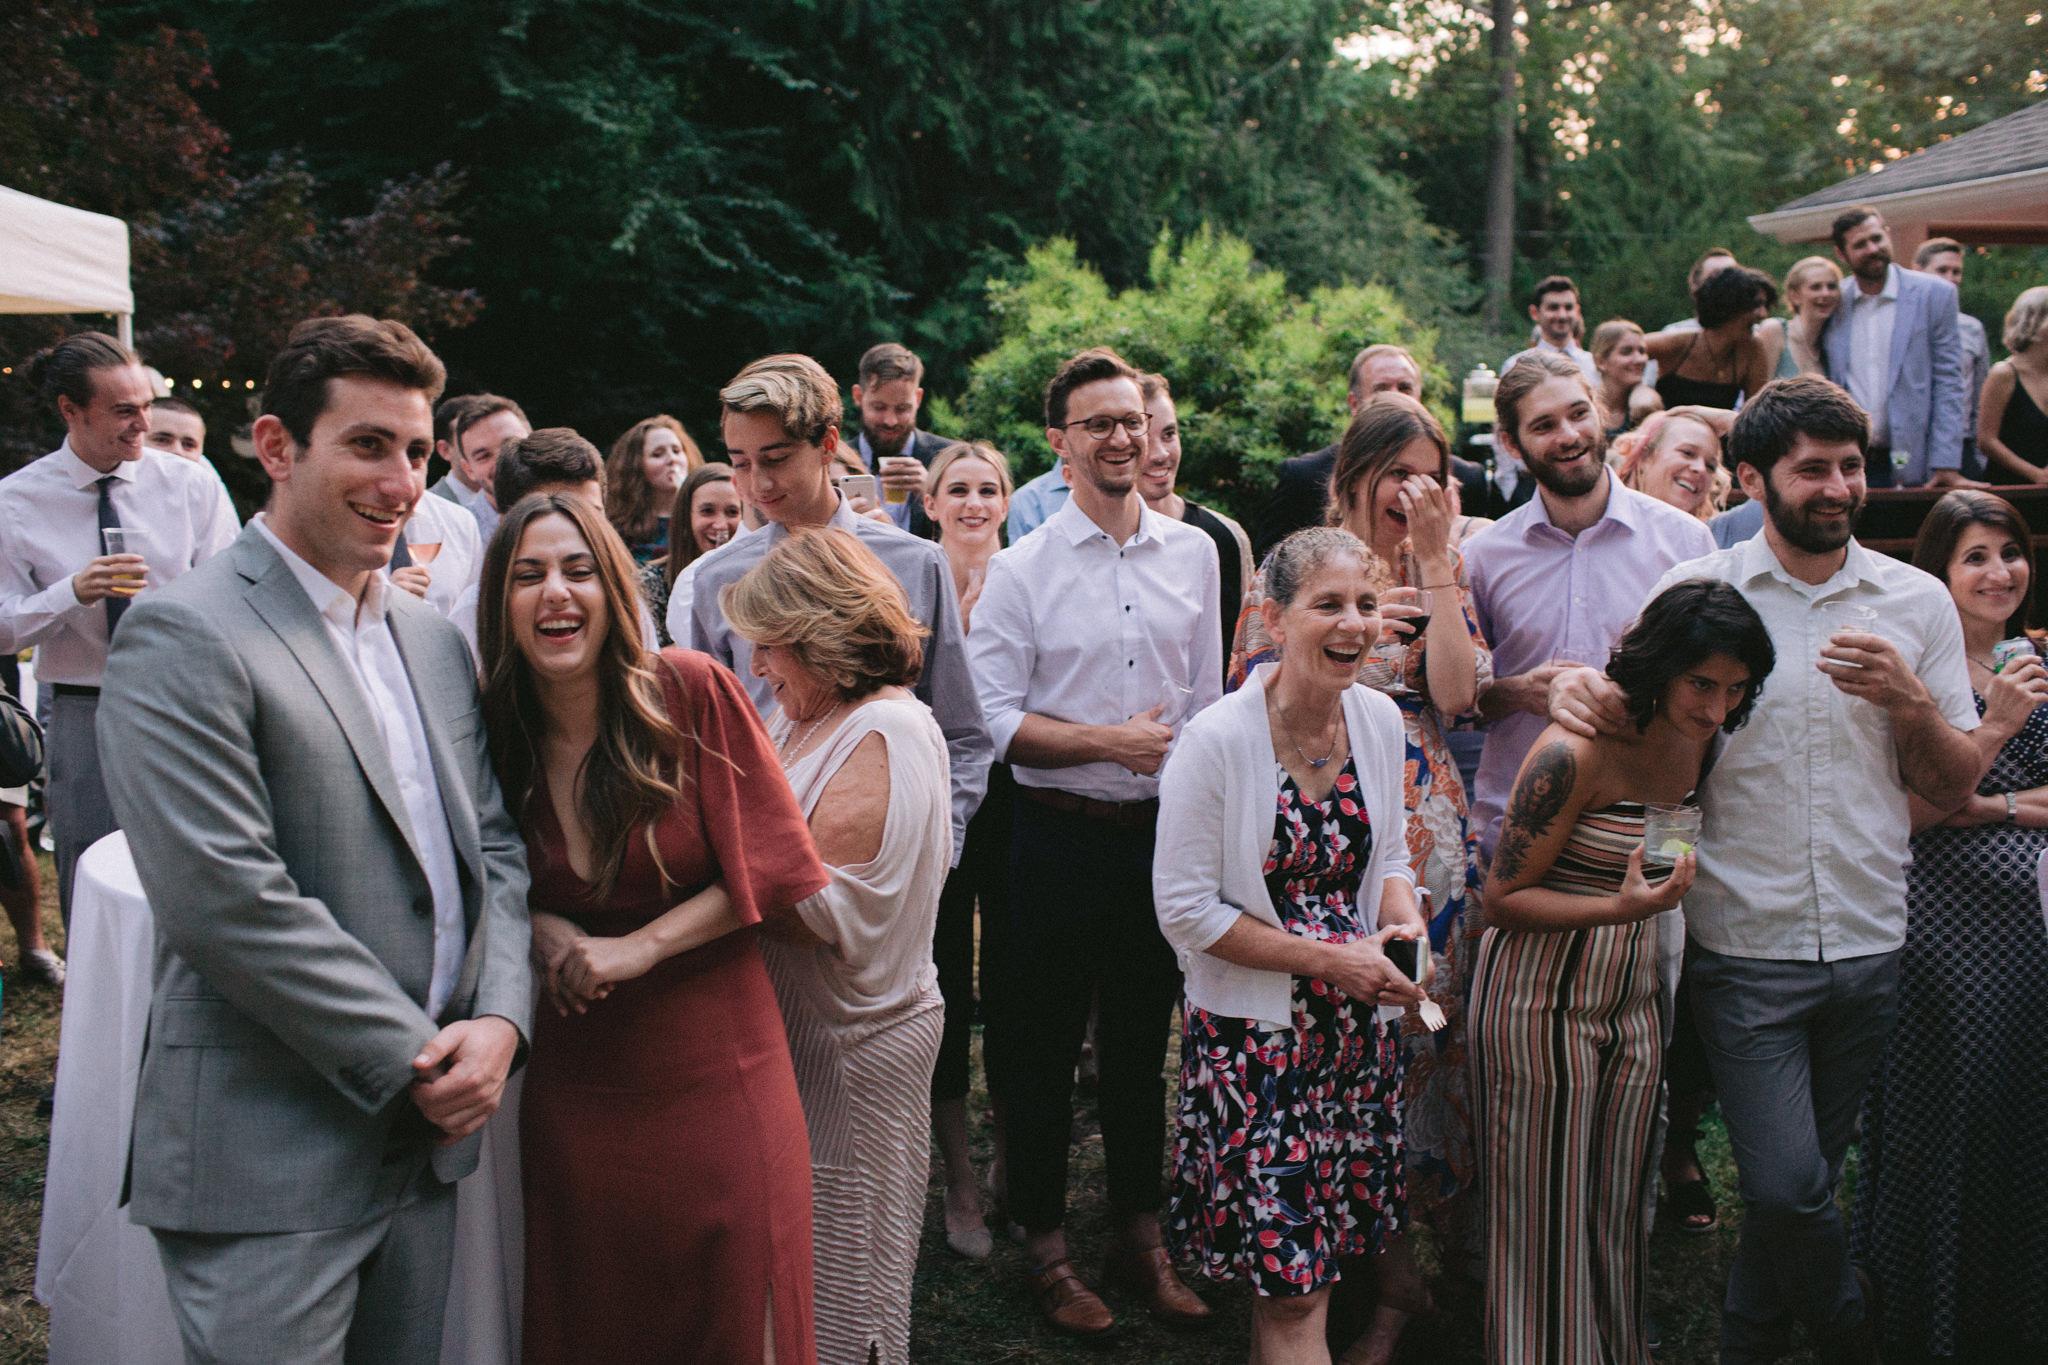 Backyard-Bainbridge-Island-Wedding-Alycia-Lovell-Photography-203.JPG